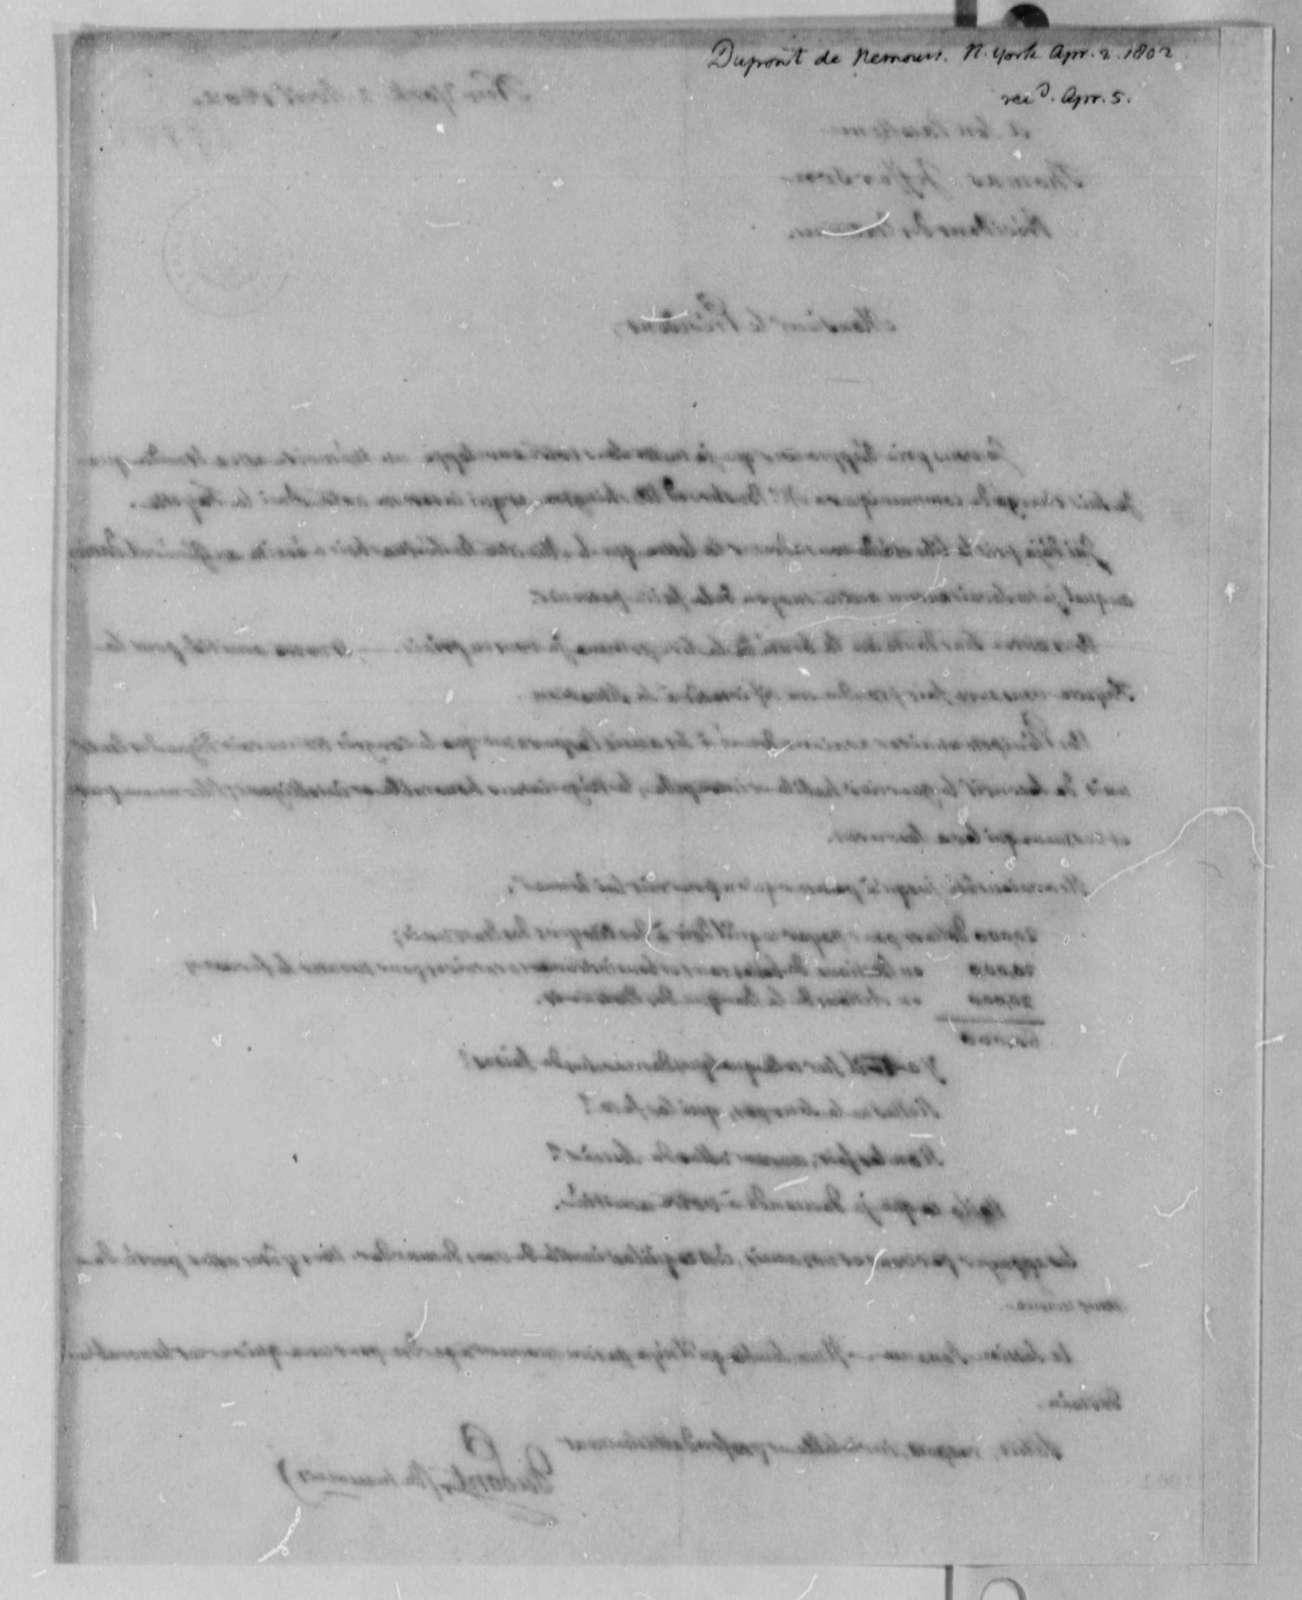 Pierre S. Dupont de Nemours to Thomas Jefferson, April 2, 1802, in French